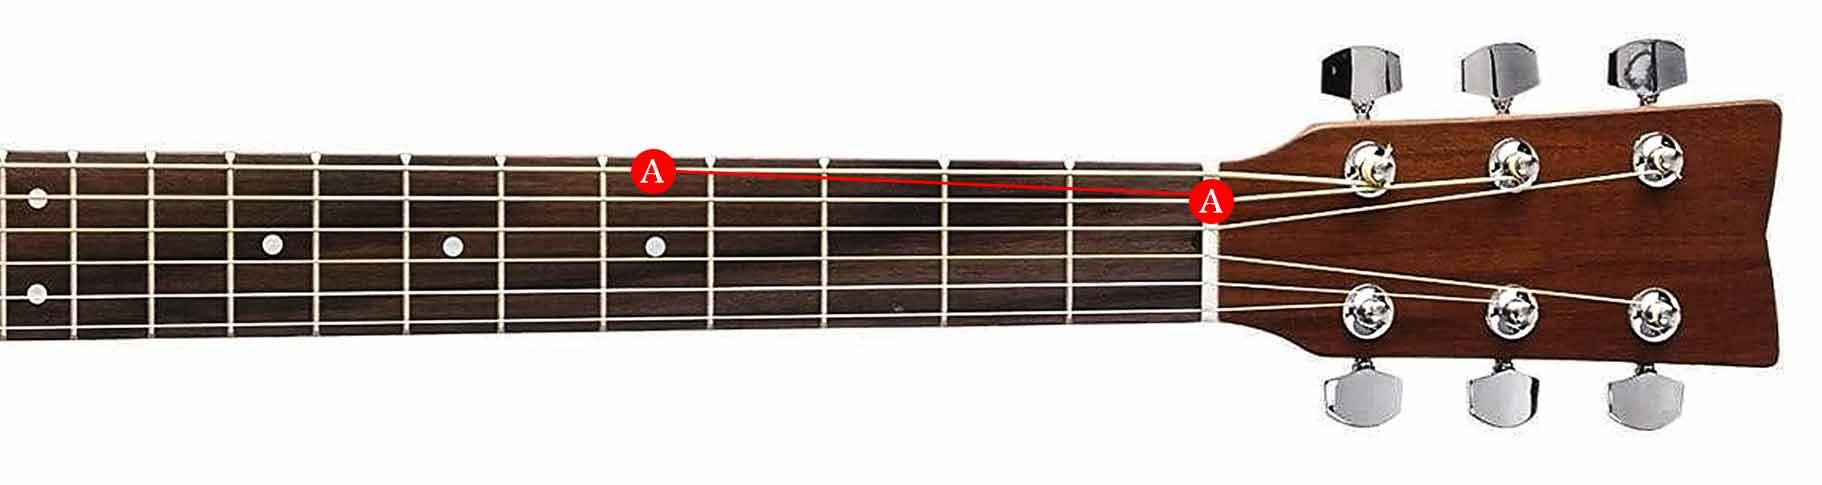 Guitar Tuning Method 2-05